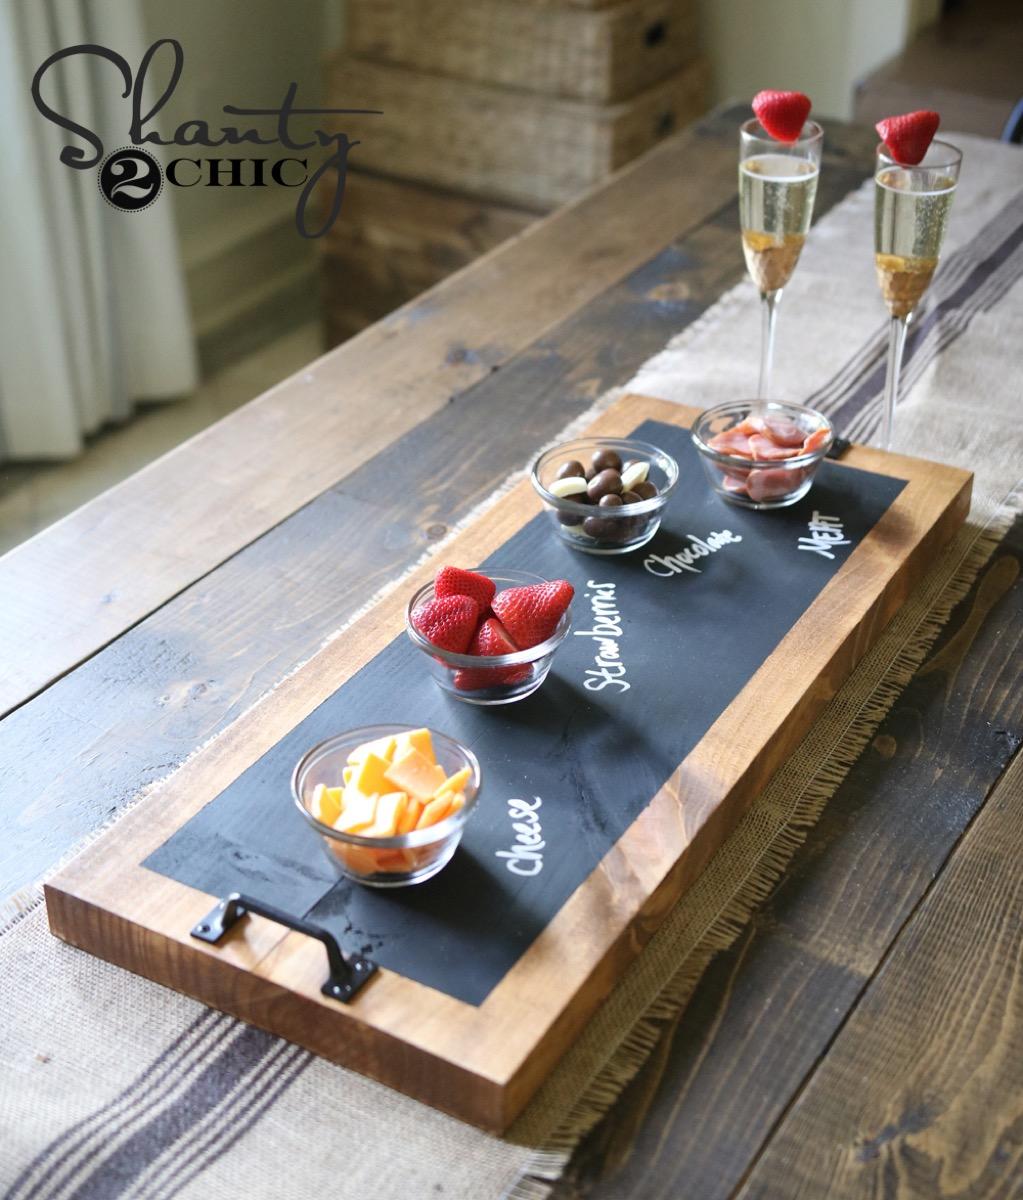 diy-gifts-designers-chalkboard-serving-tray